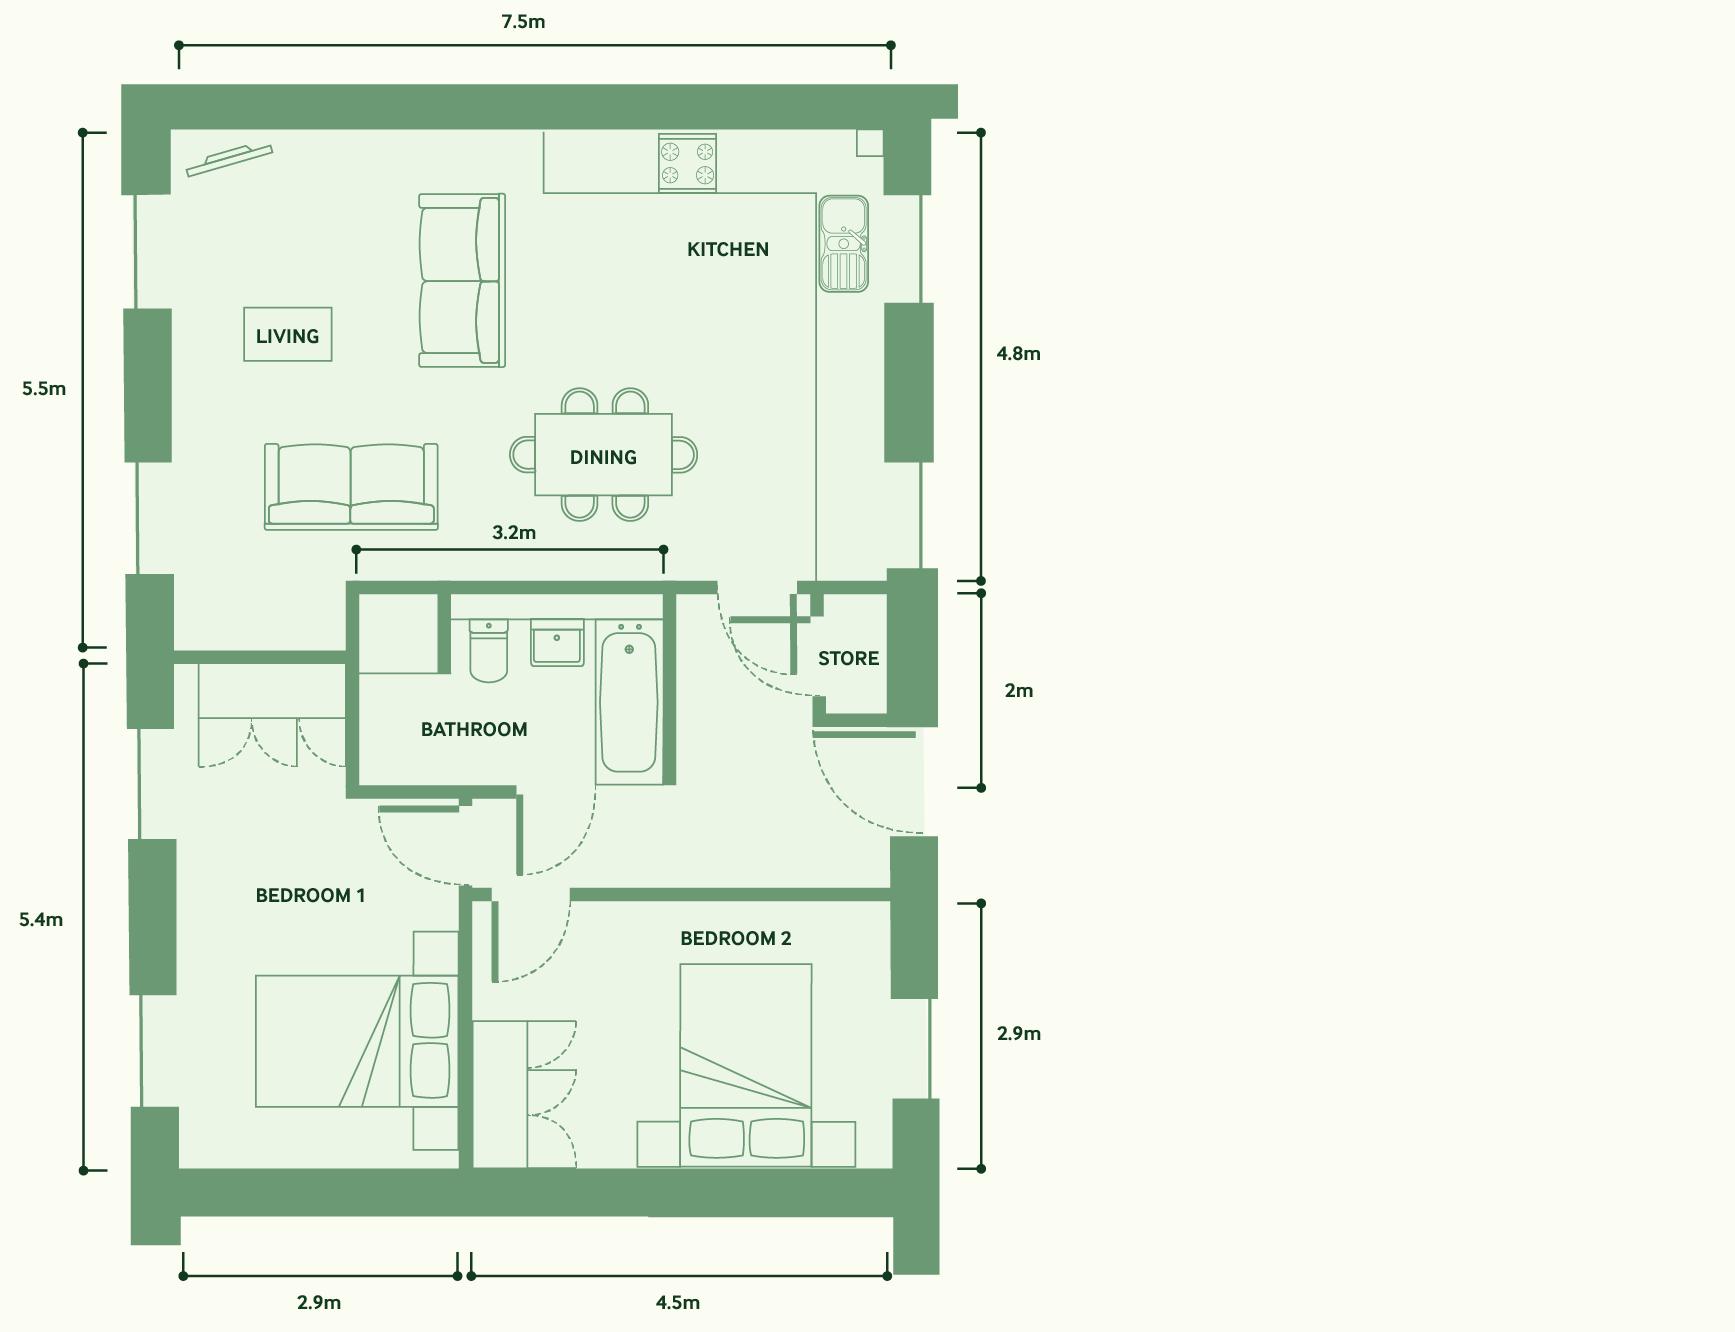 _Mundella-sfw-floorplan-export-apt-10-and-5.png